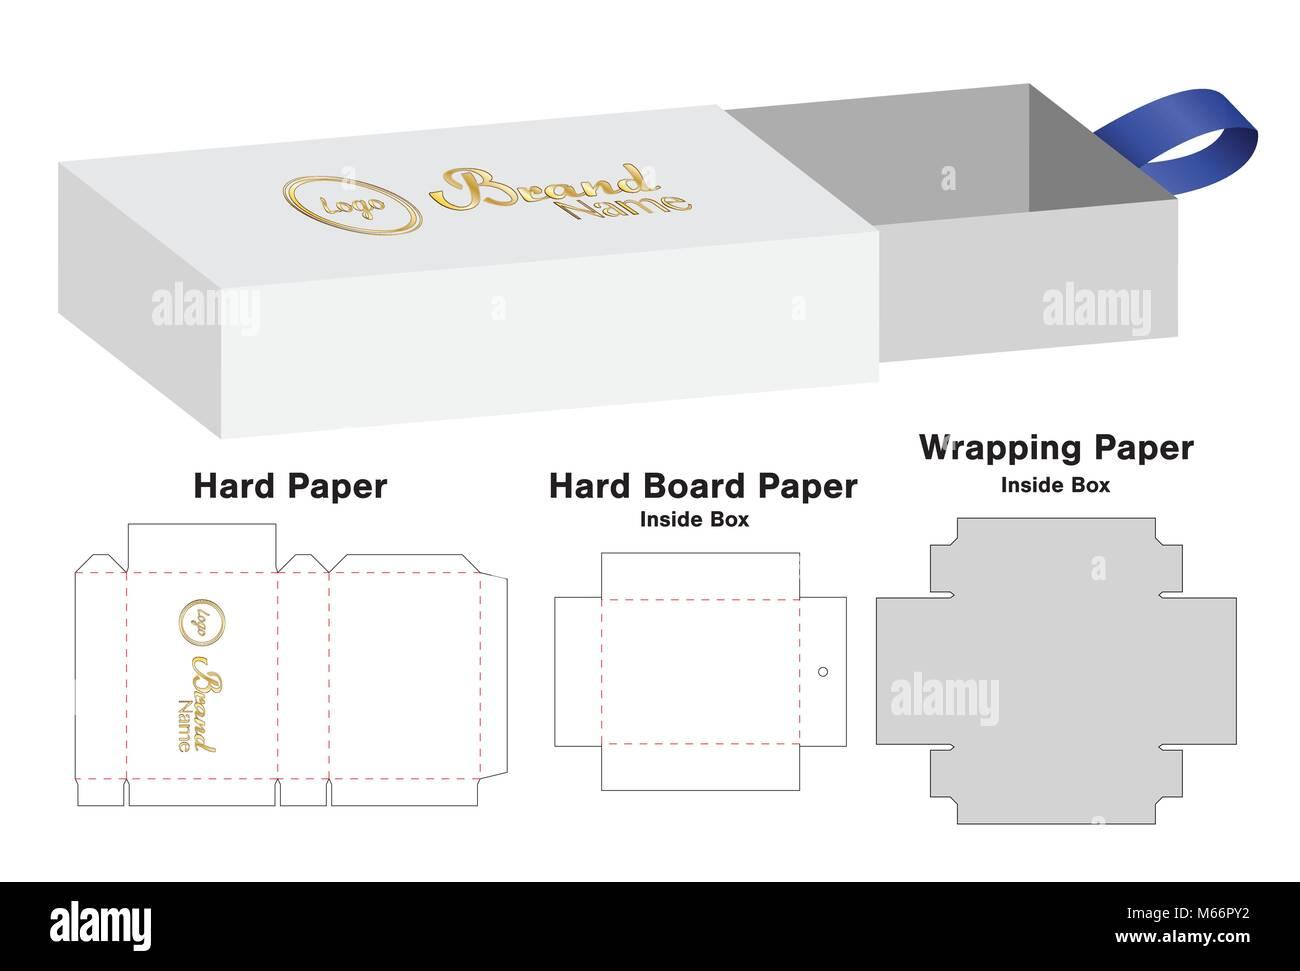 box packaging die cut template design 3d mock up stock vector art